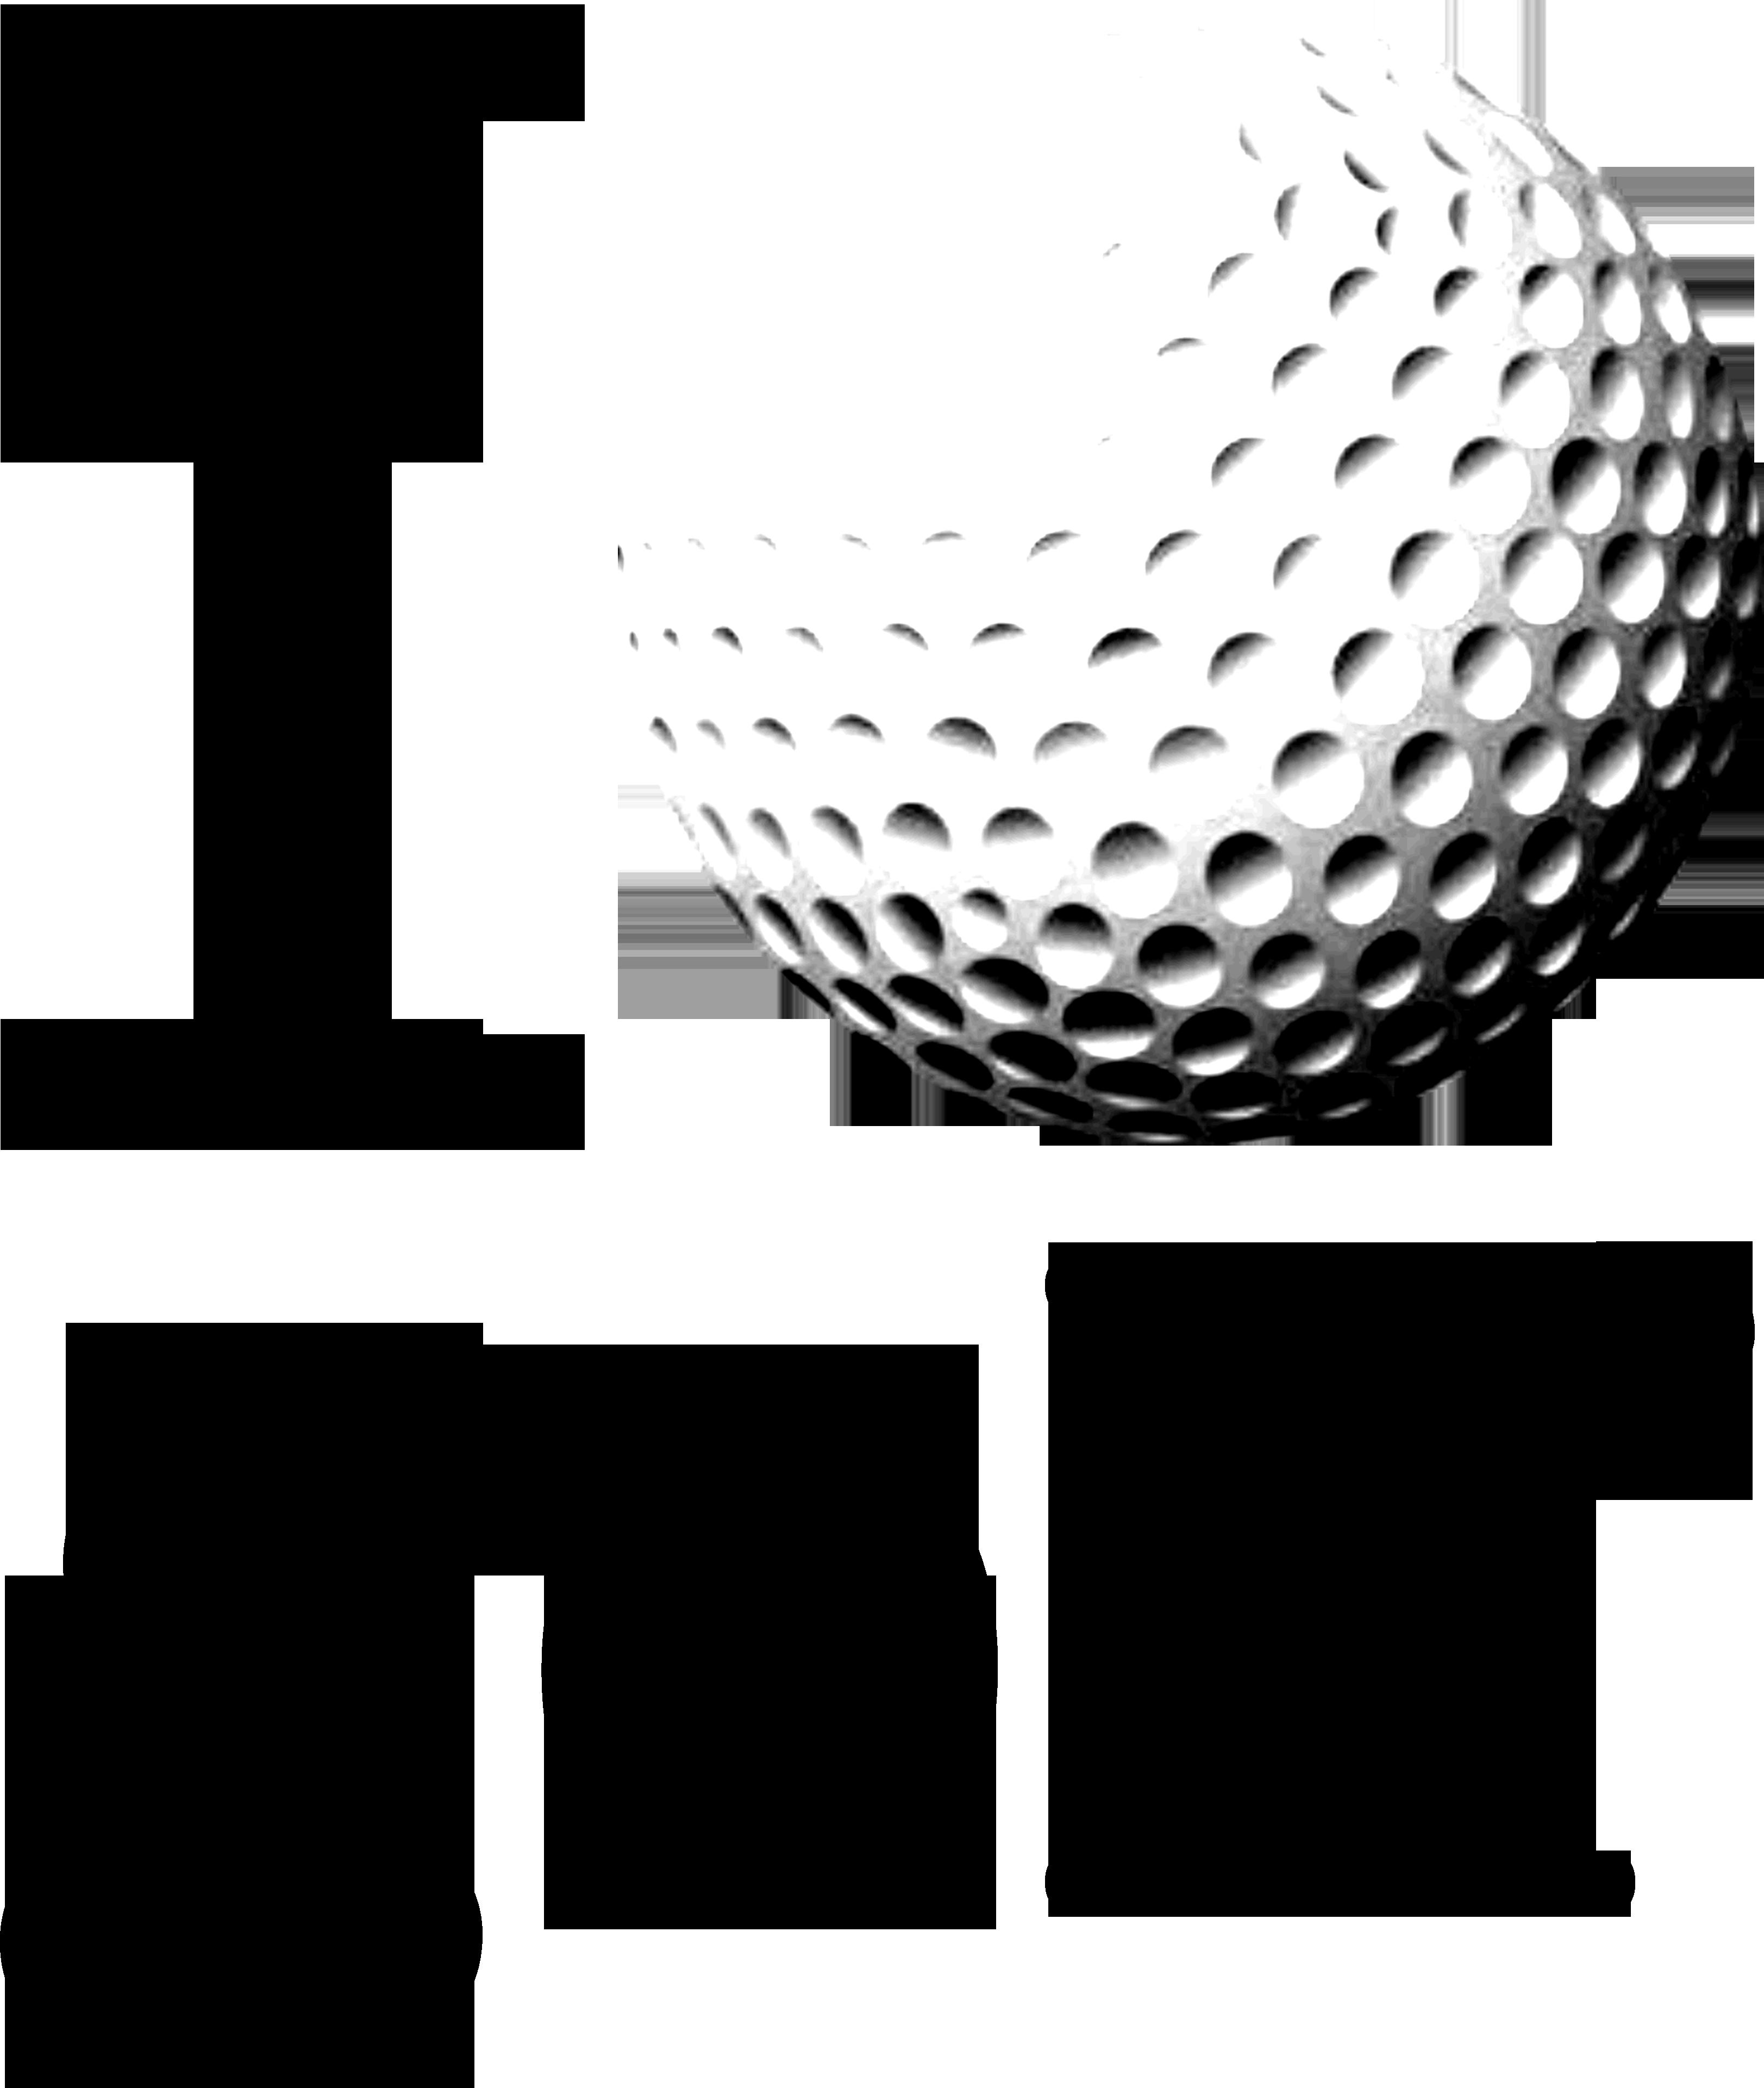 Golfer clipart black and white, Golfer black and white ...